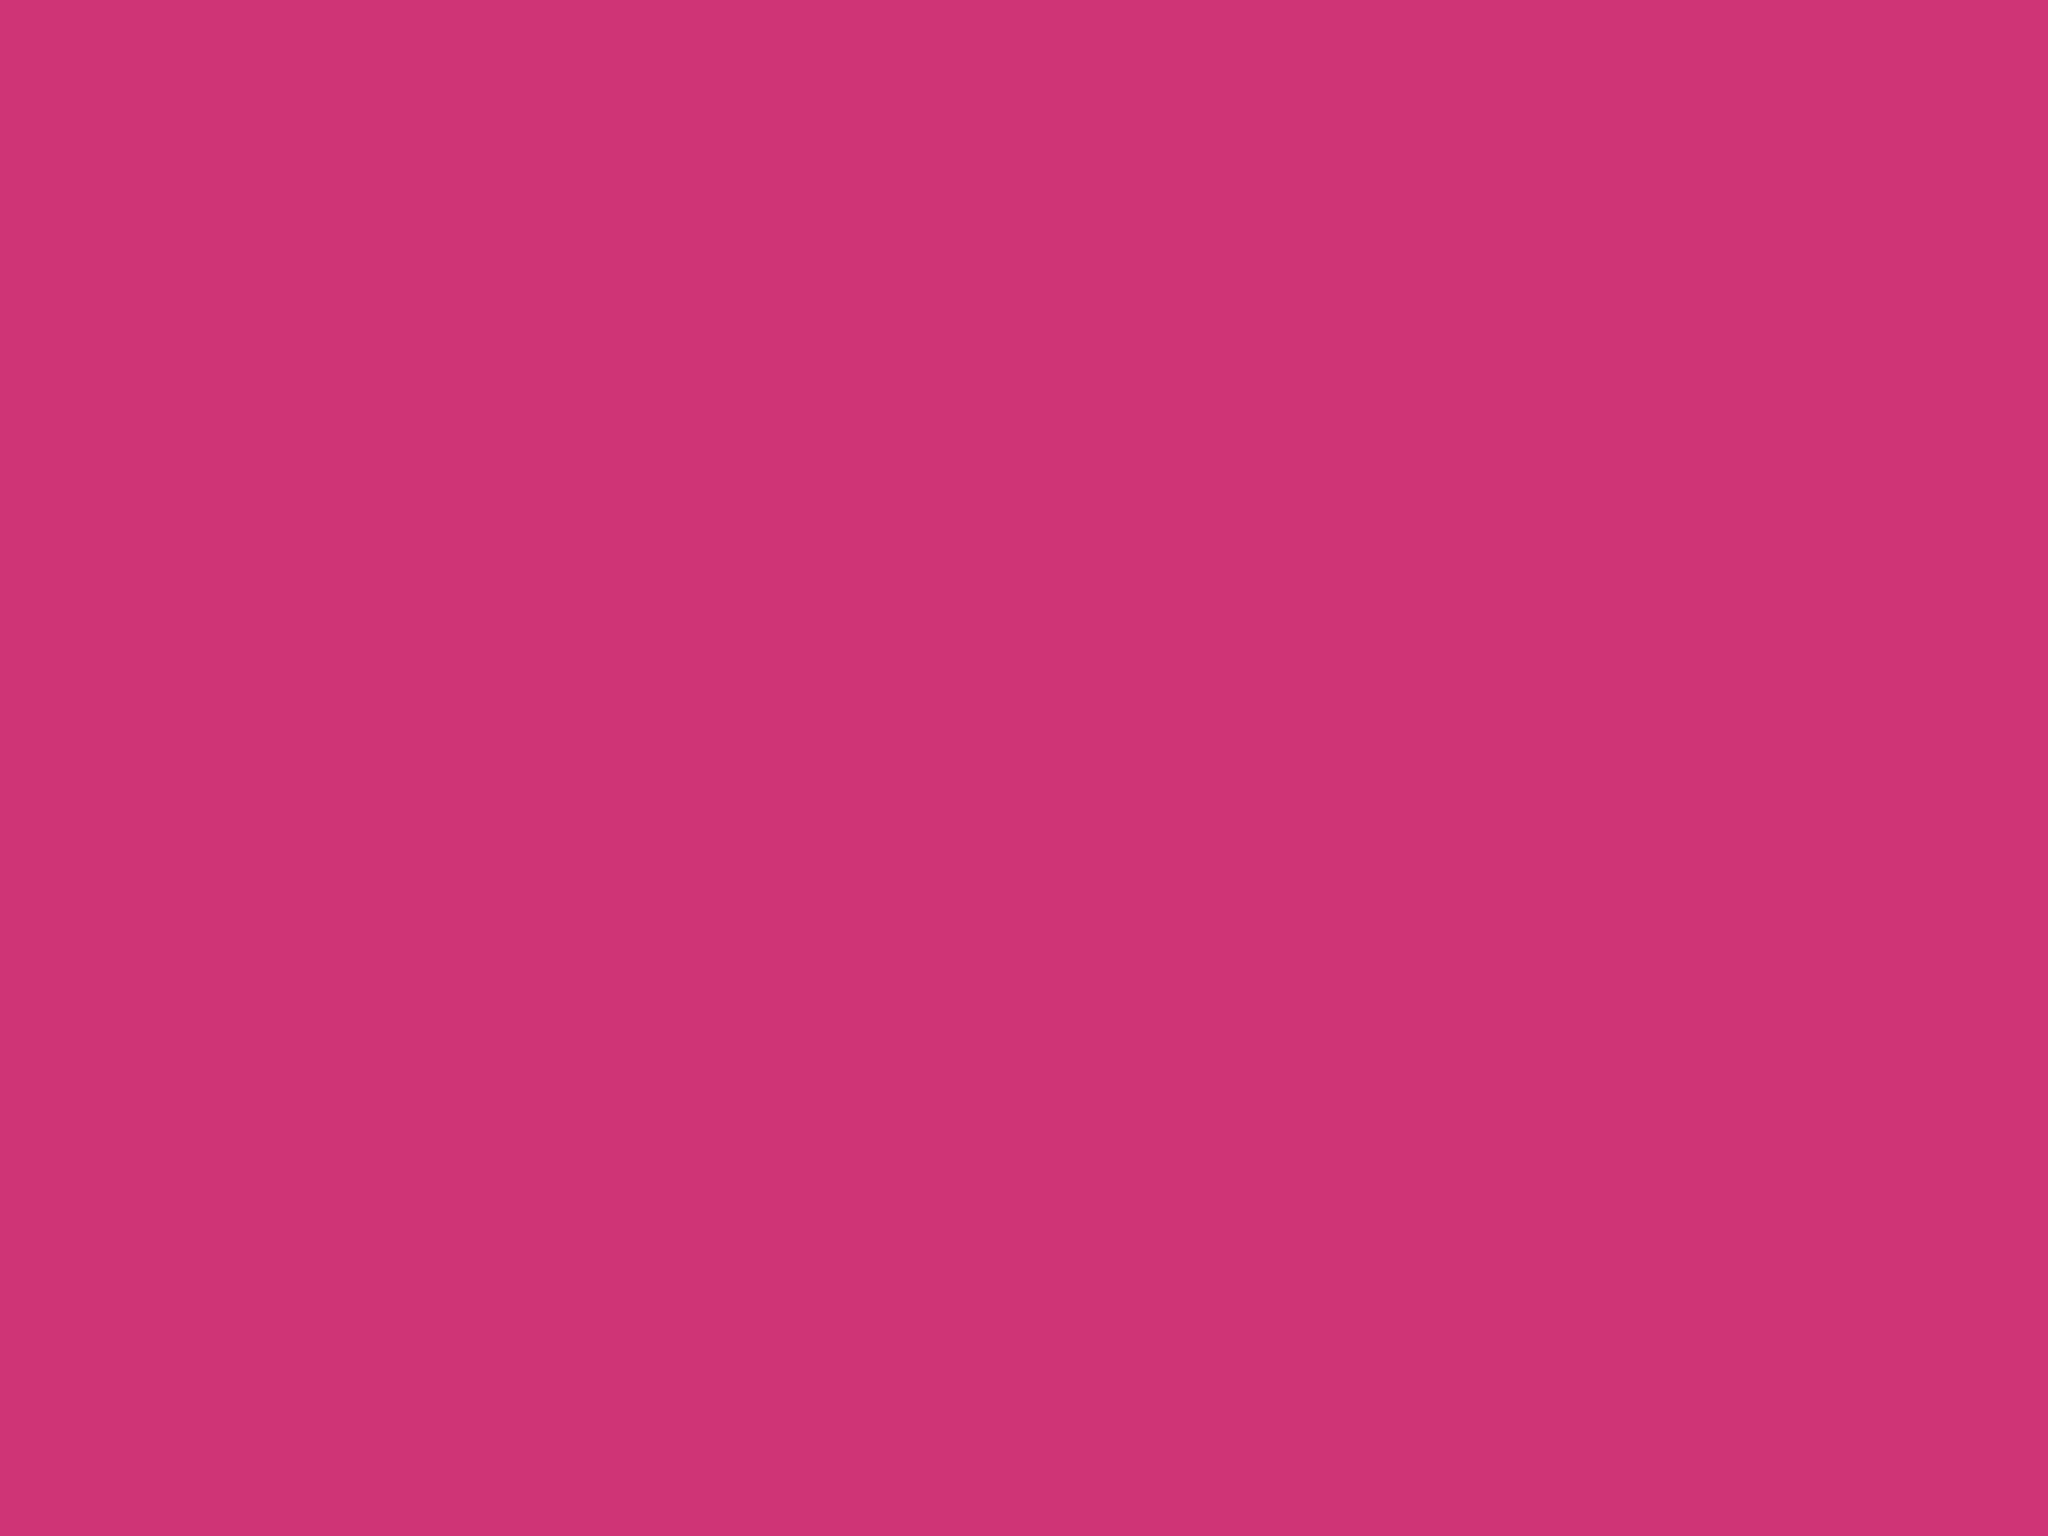 2048x1536 Telemagenta Solid Color Background